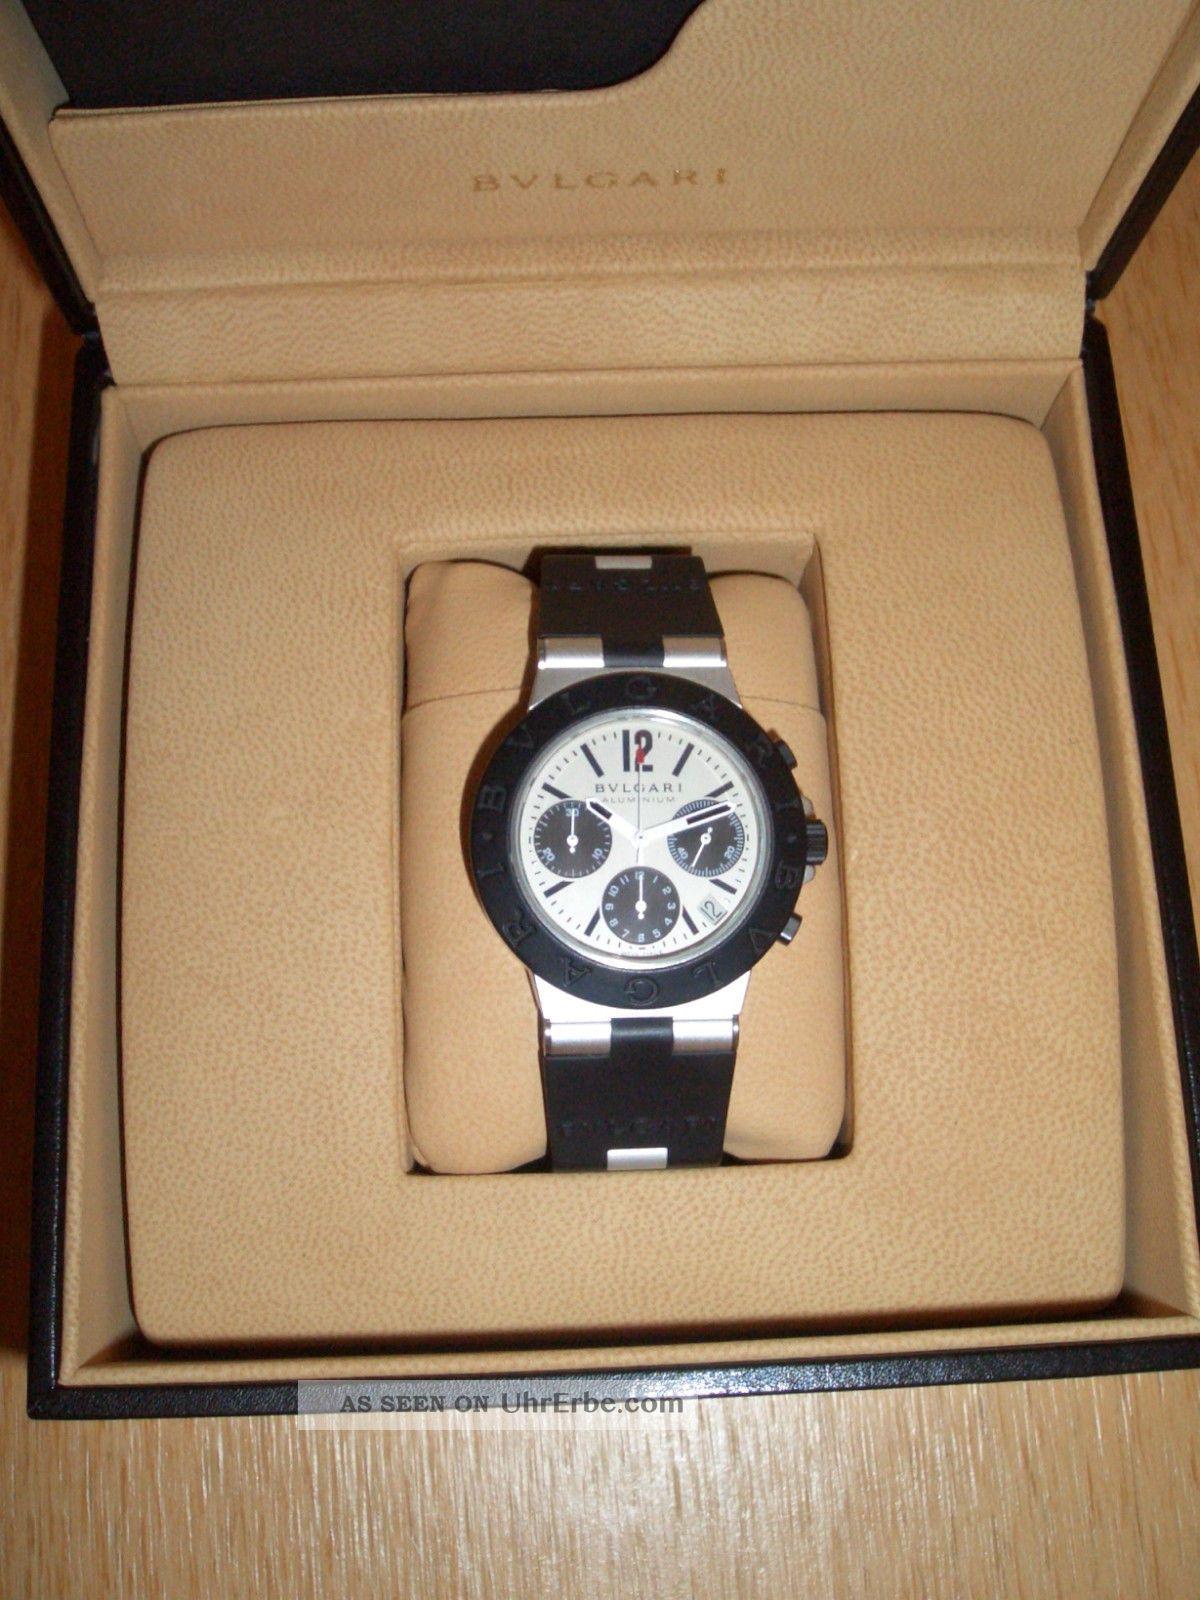 bulgari bvlgari armbanduhr chronograph uhr automatik top. Black Bedroom Furniture Sets. Home Design Ideas